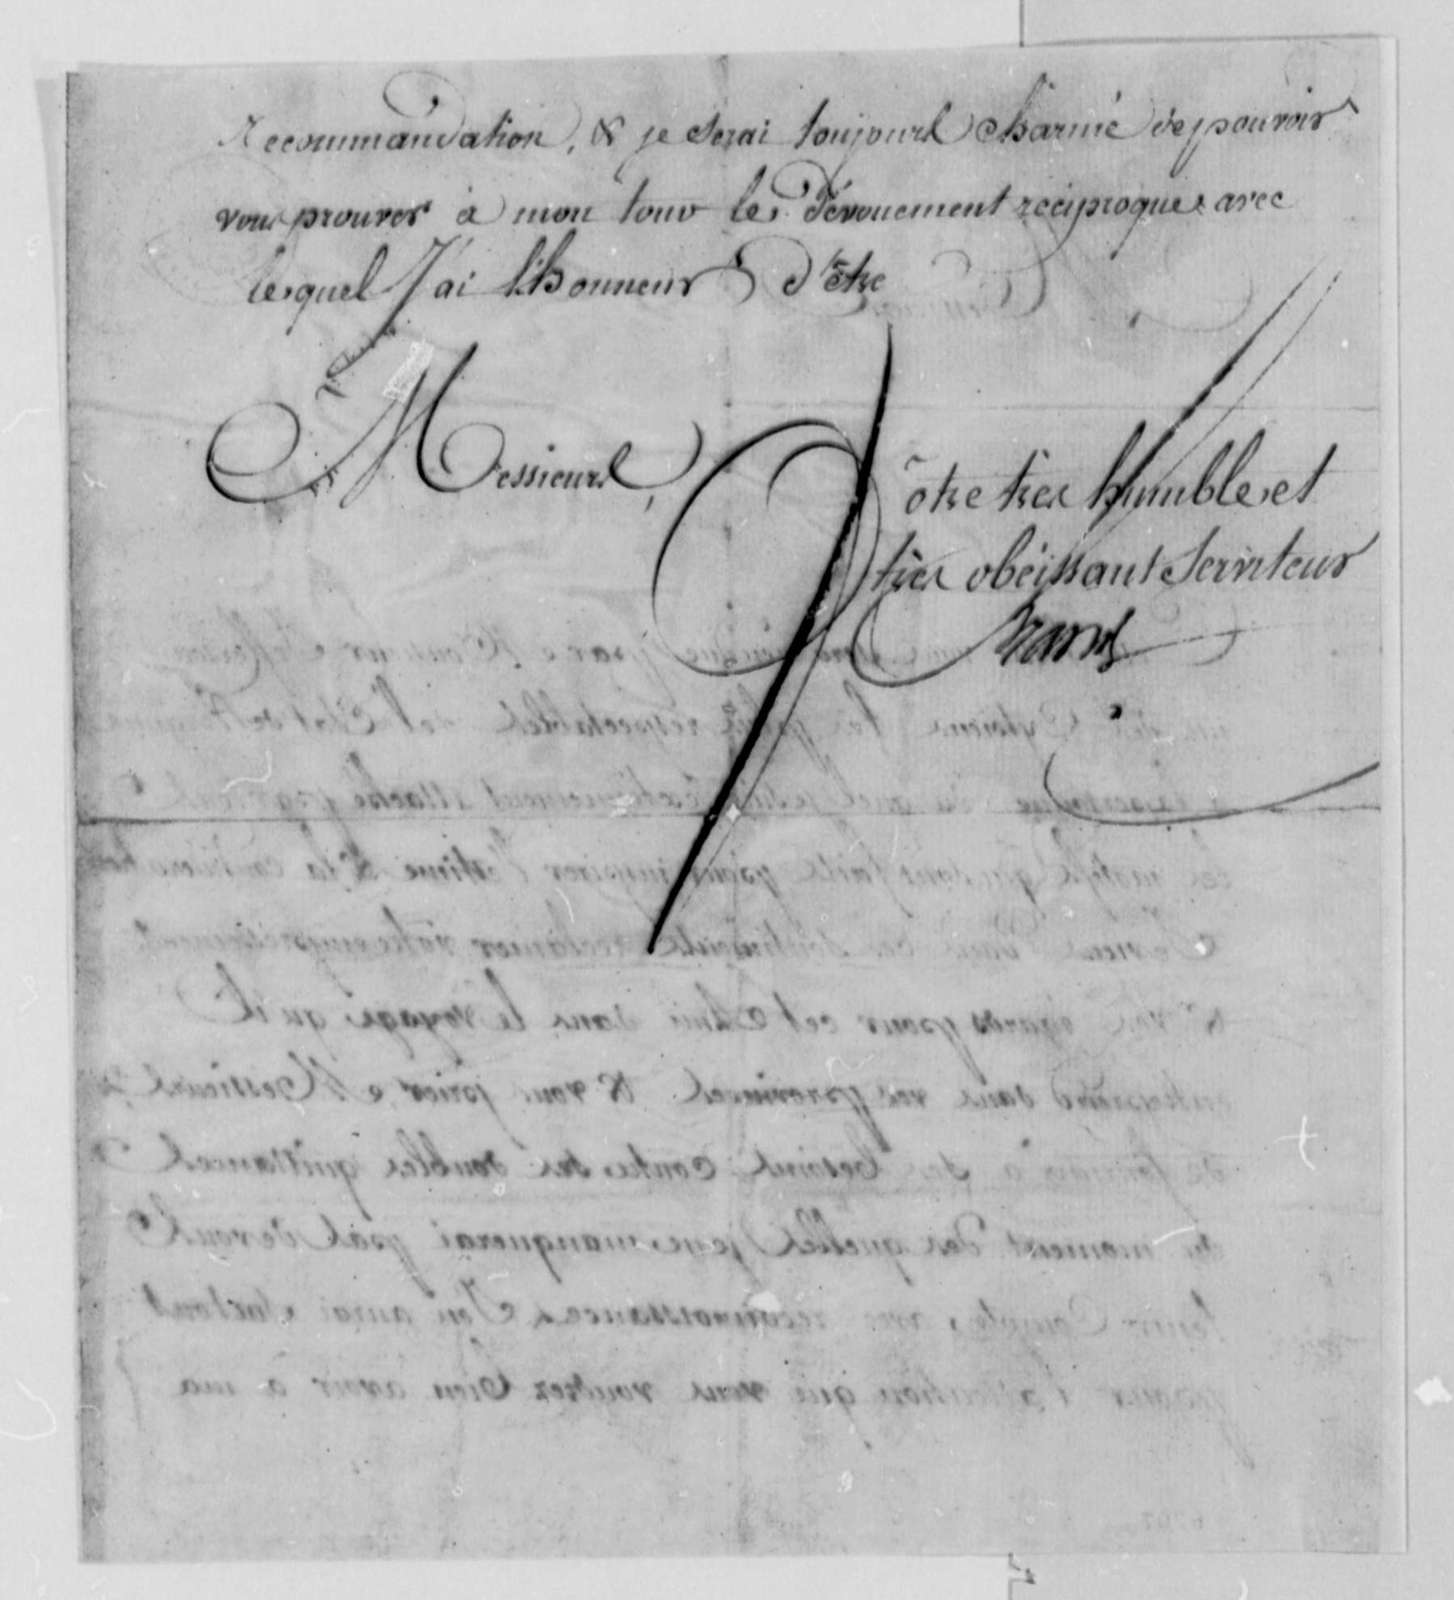 Ferdinand Grand to Thomas Jefferson, 1787, in French